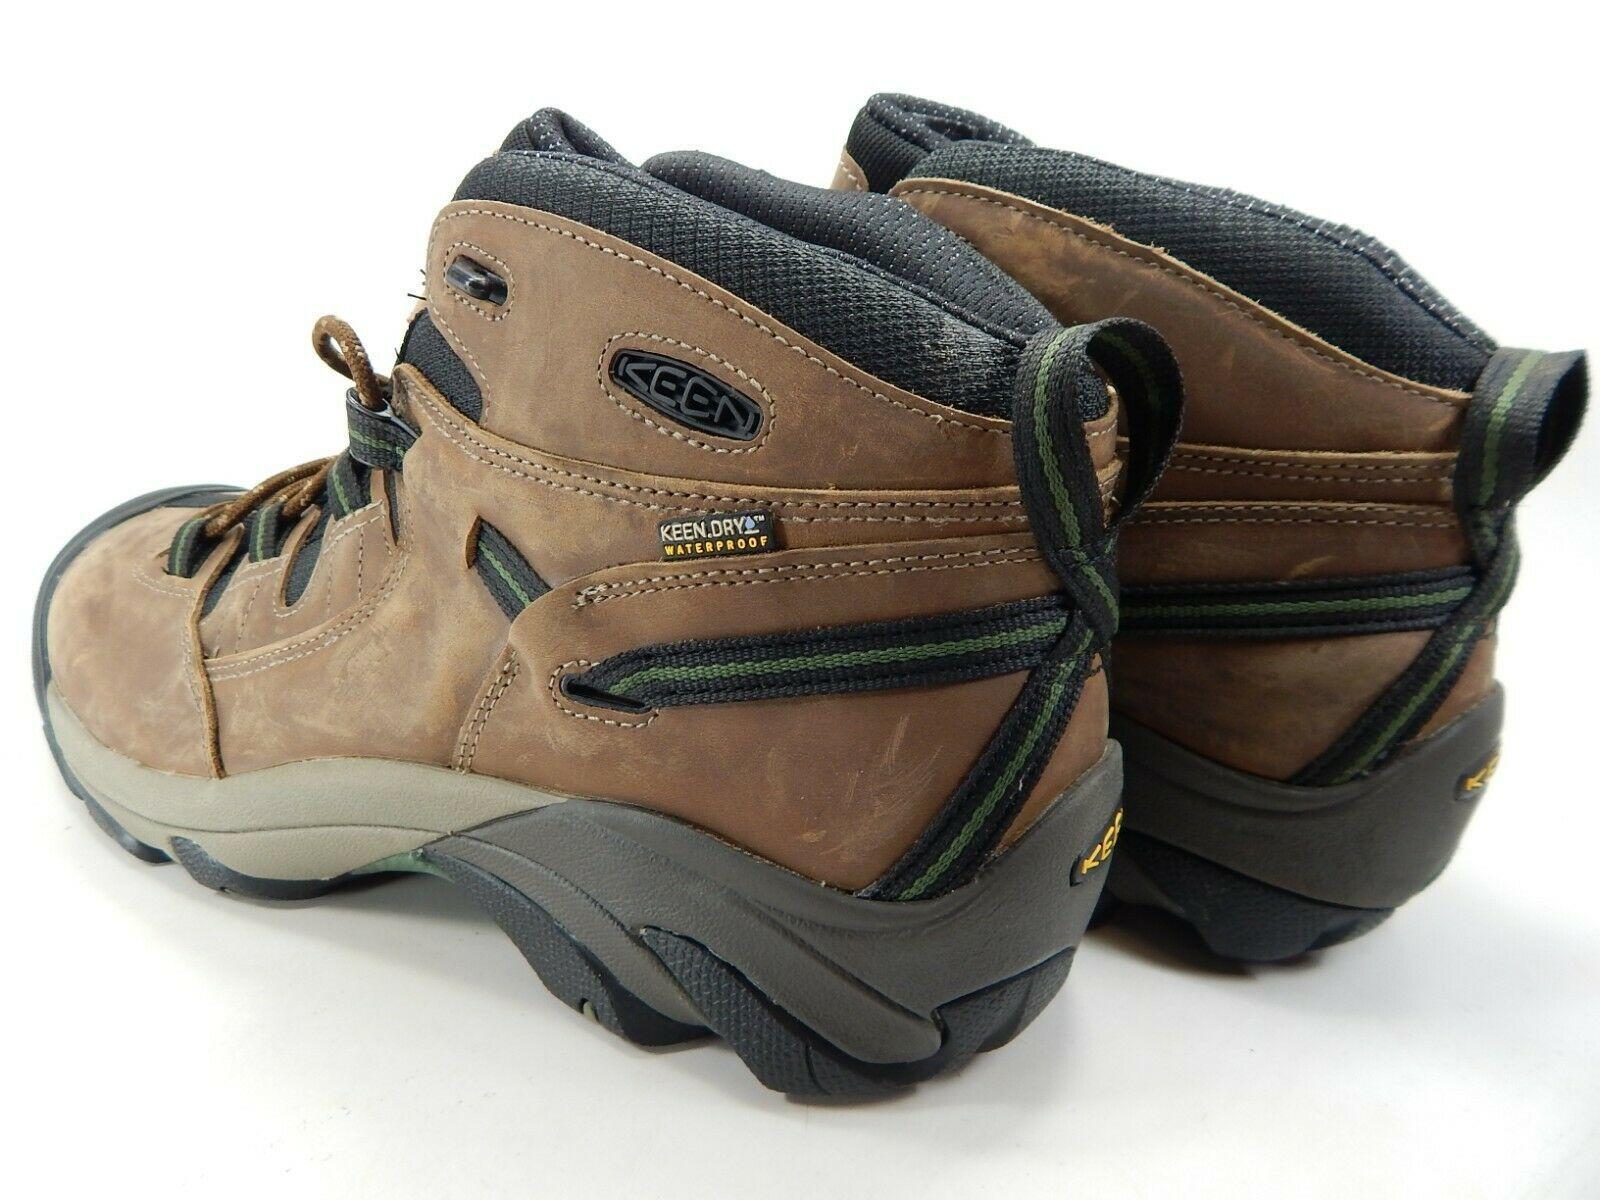 Keen Detroit Mid Size US 13 M (D) EU 47 Men's Steel Toe Work Boots Brown 1007003